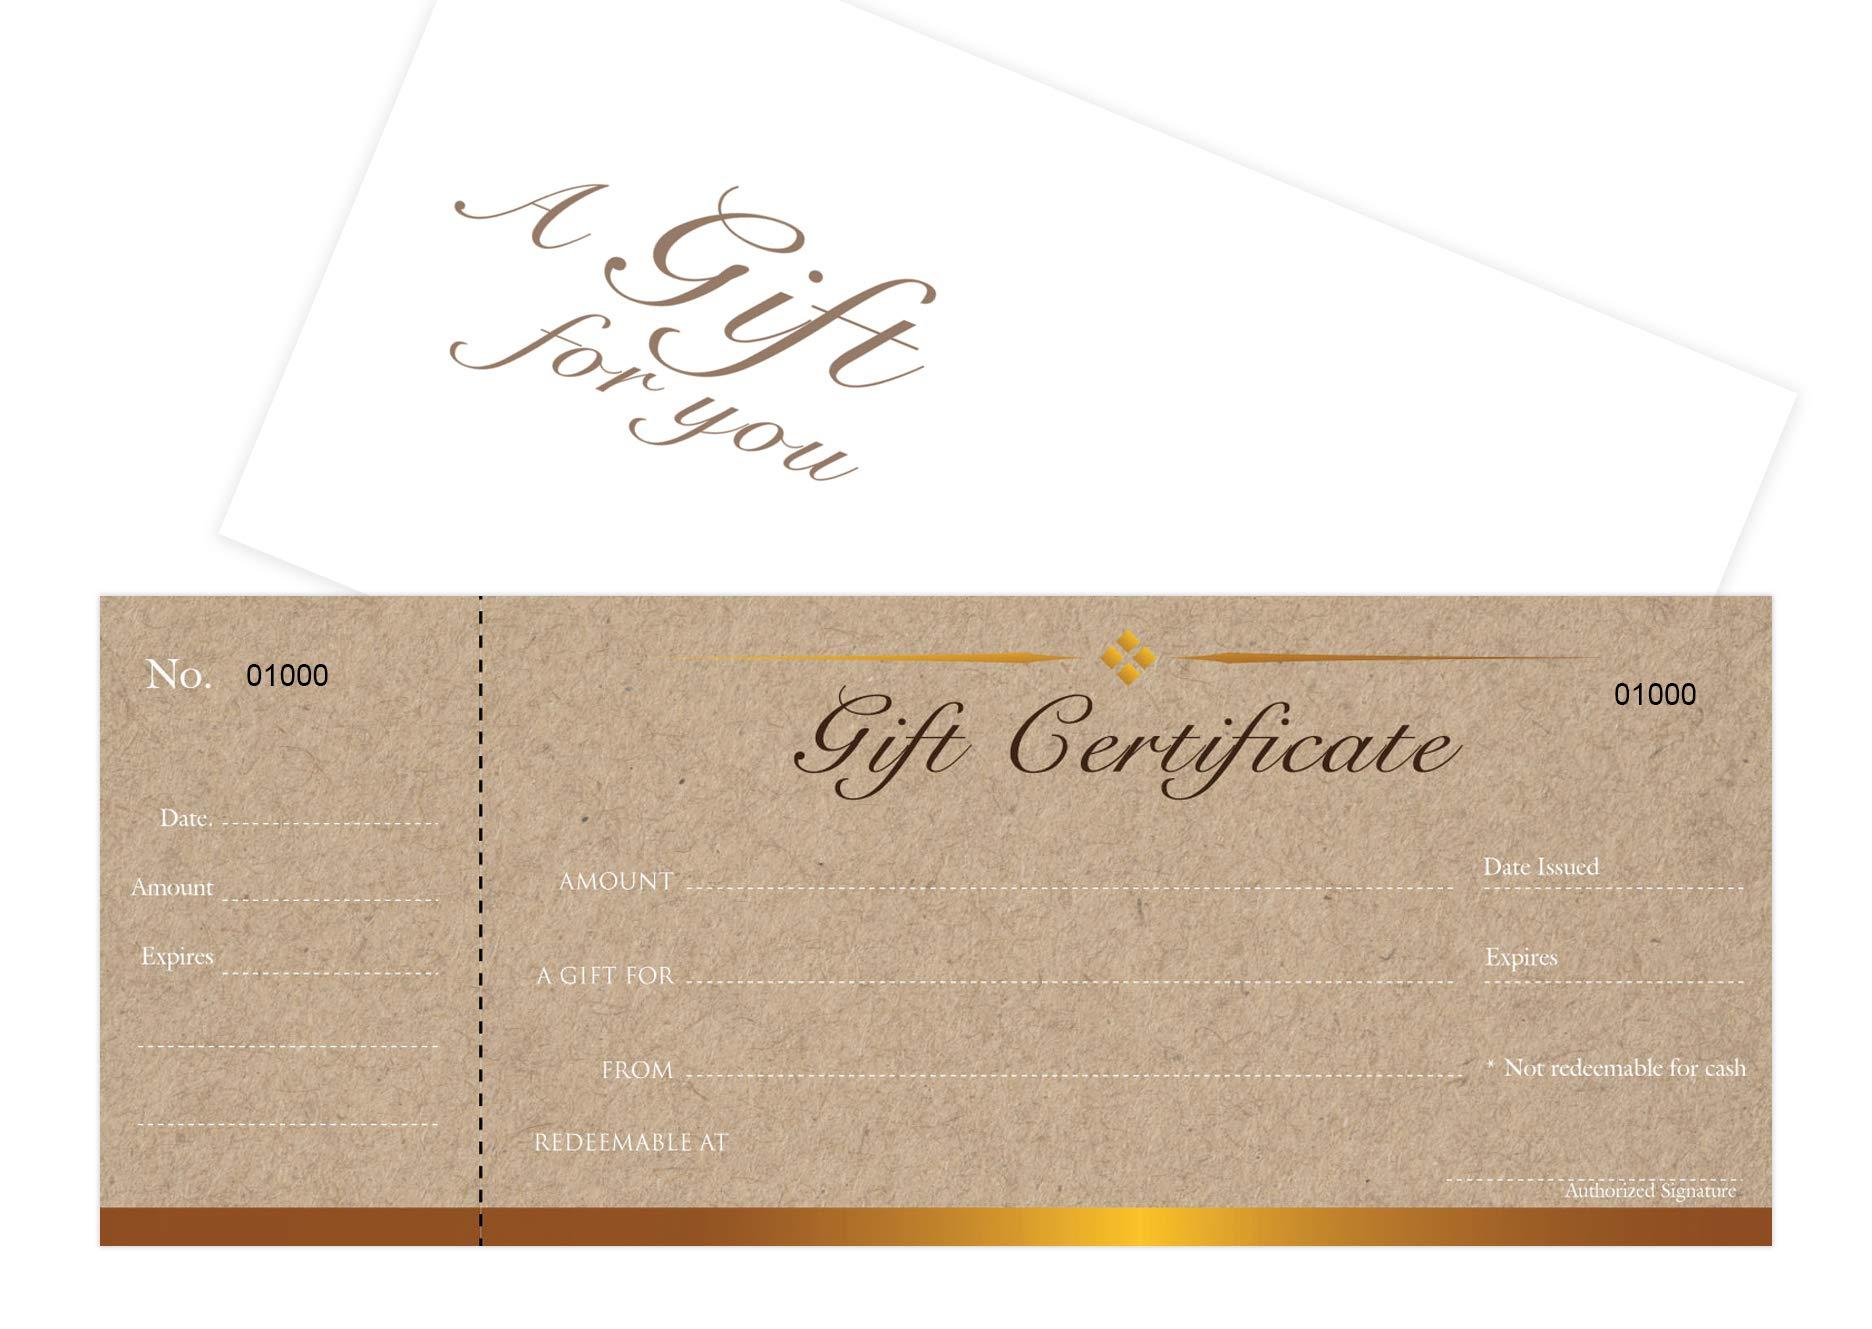 Blank Gift Certificates Cards With Envel Buy Online In Israel At Desertcart